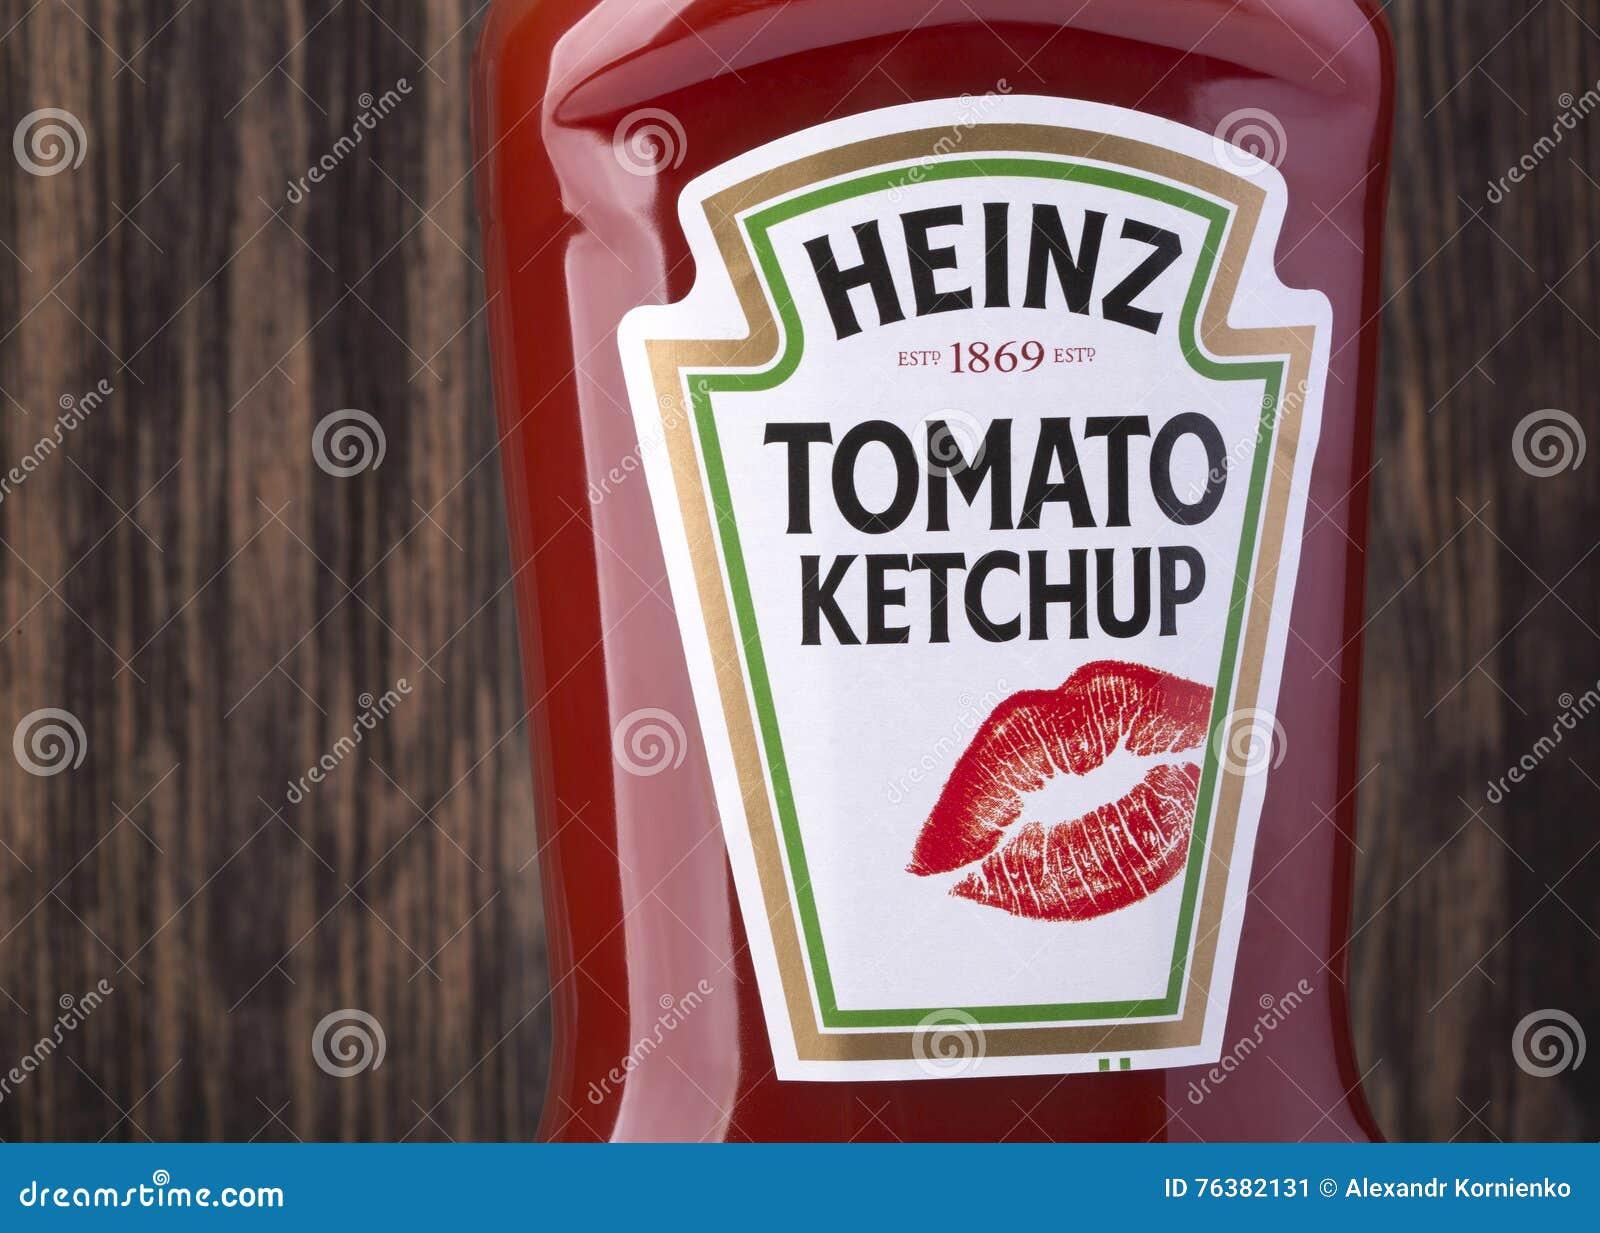 Bottle of Heinz Tomato Ketchup